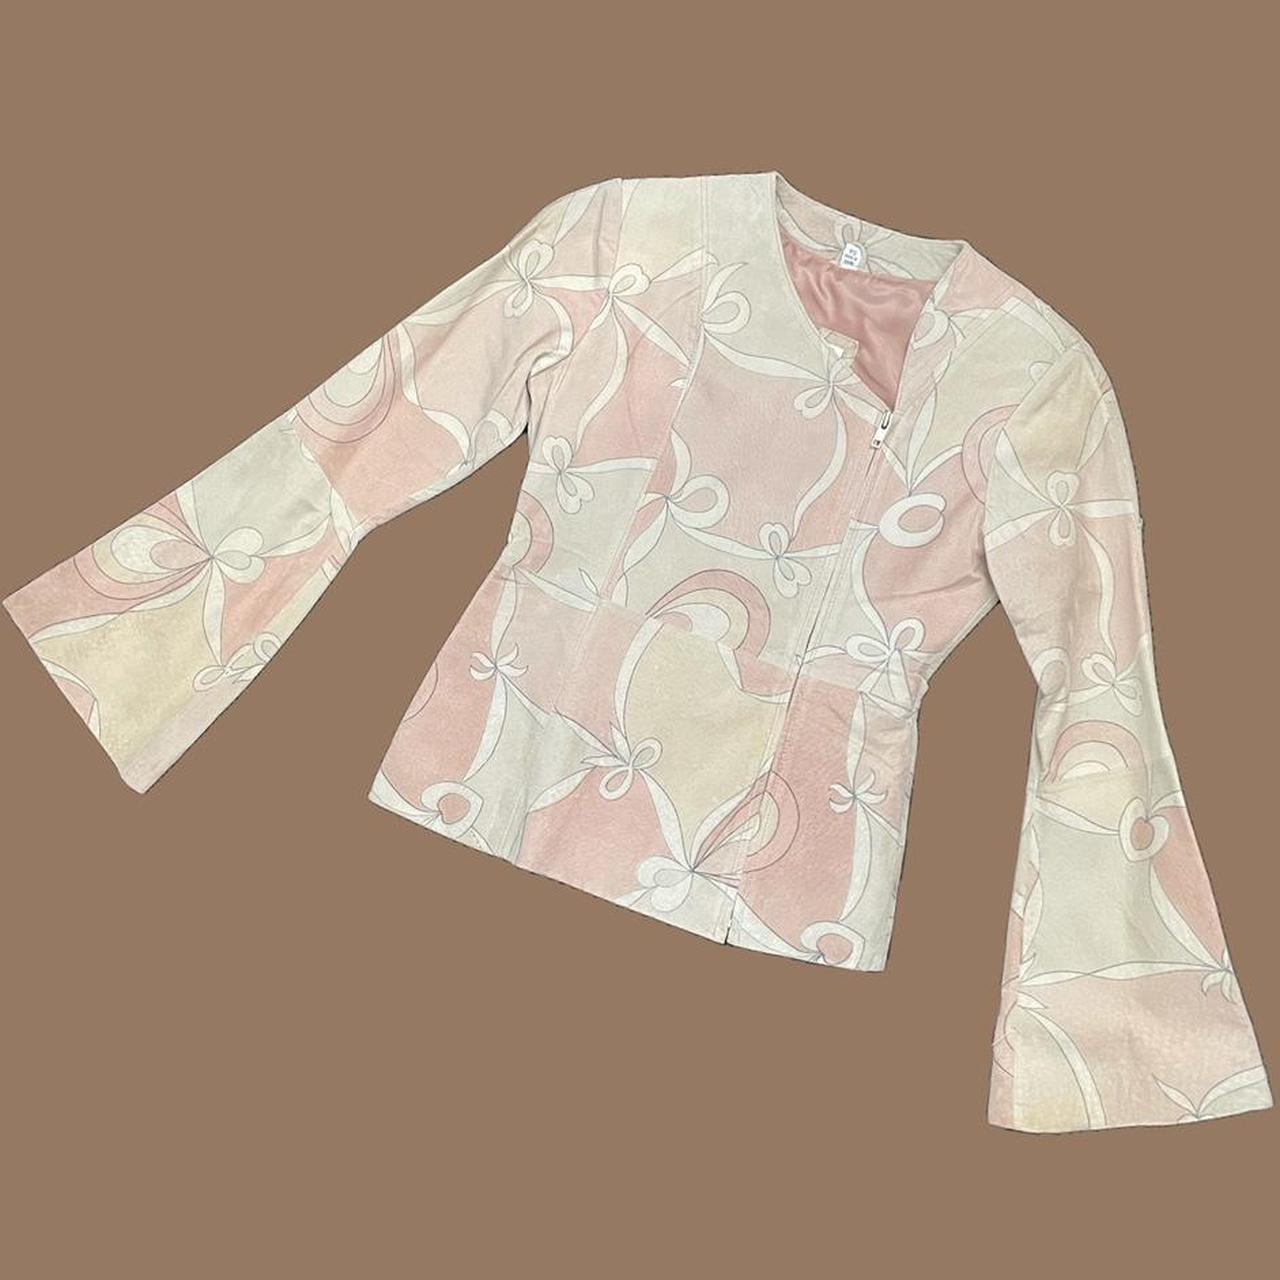 Product Image 1 - 🎀vintage flare sleeve fall jacket  🎀brand